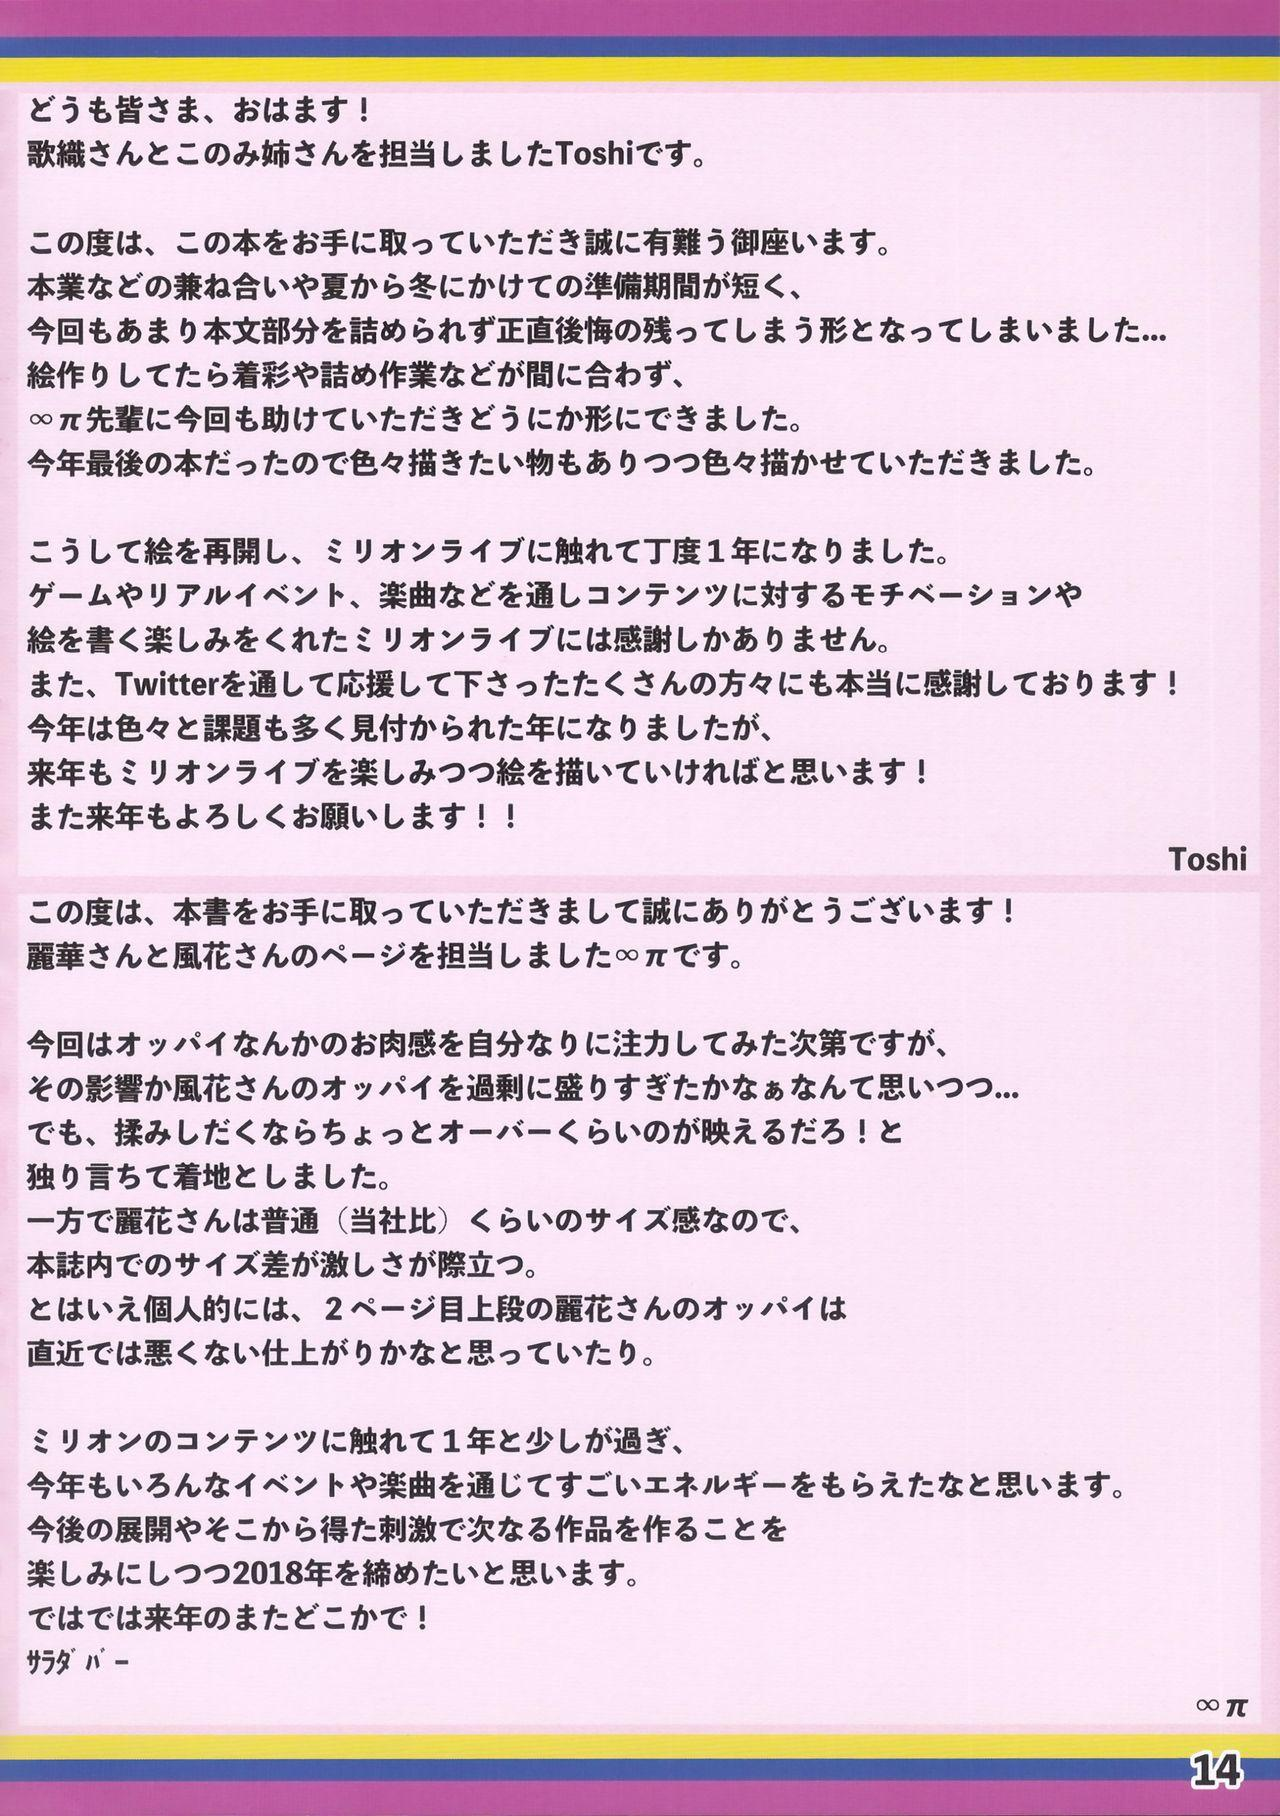 (C95) [LittleGraffiti (Toshi, ∞π) The Graffiti 03 (THE IDOLM@STER MILLION LIVE!) 14